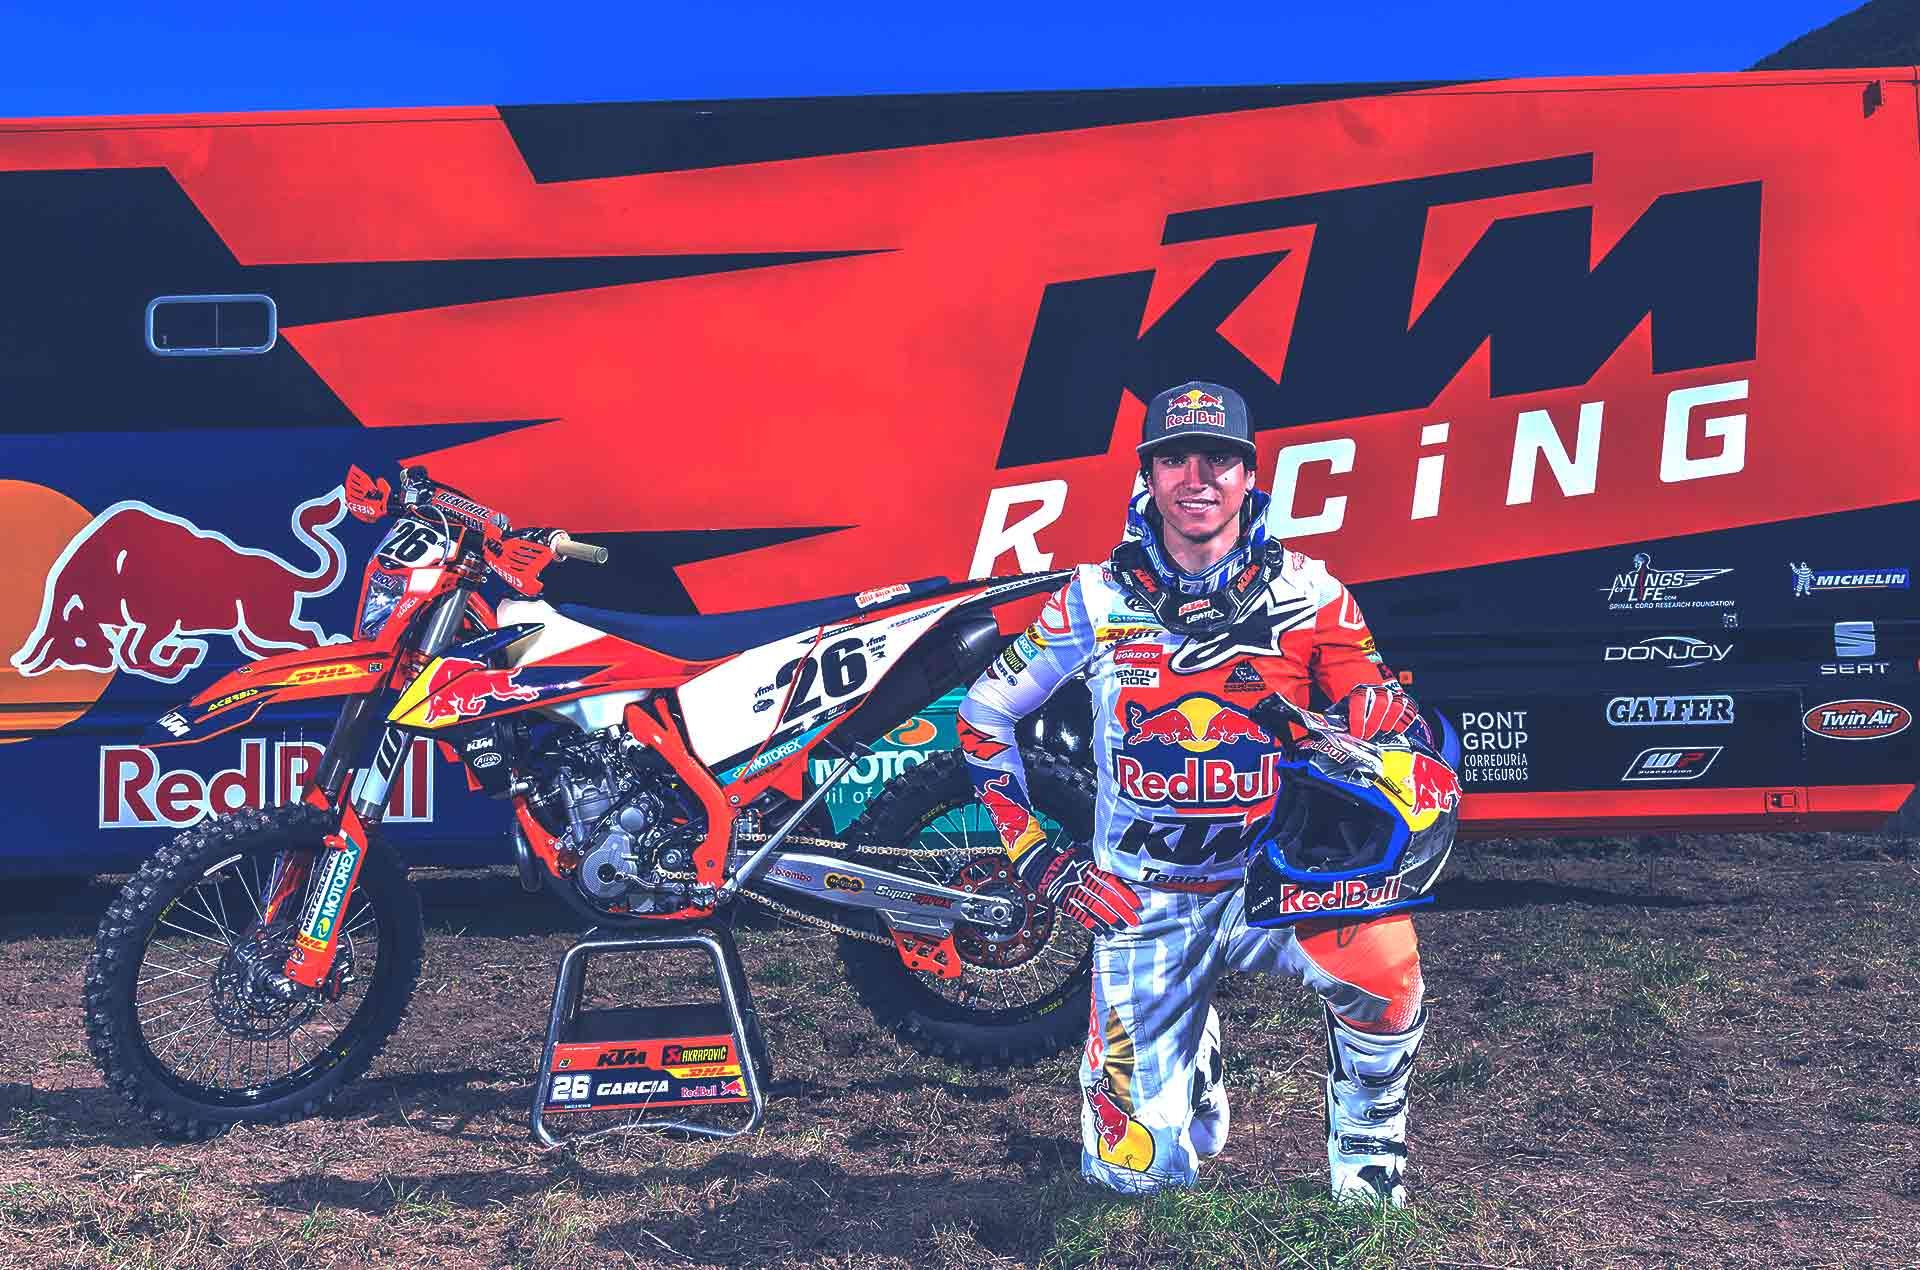 Josep Garcia 26 Enduro Ktm Rider Red Bull